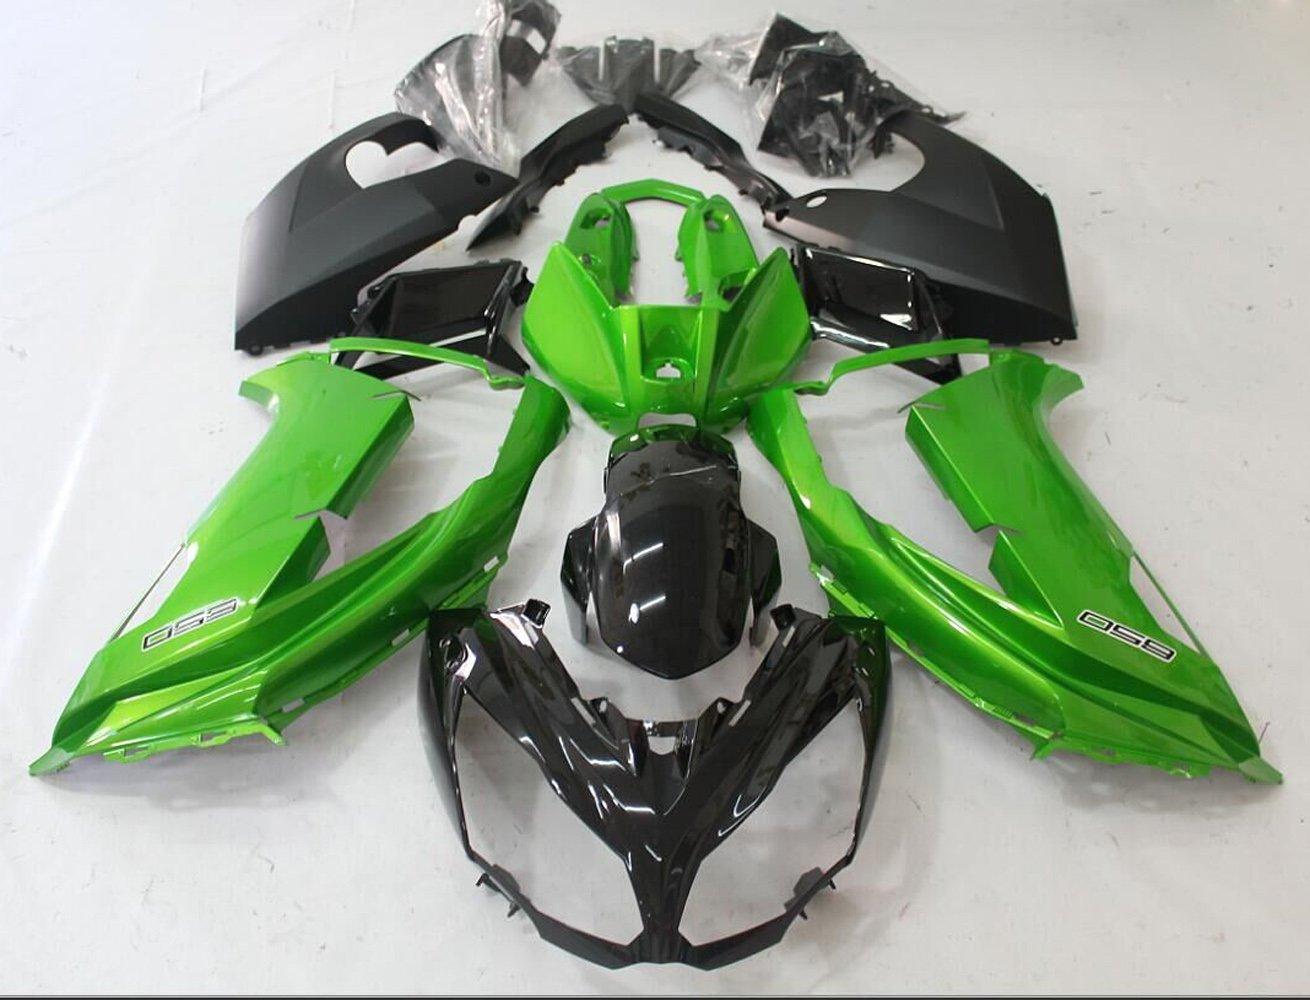 Amazon.com: ZXMOTO Motorcycle Bodywork Fairing Kit for ...